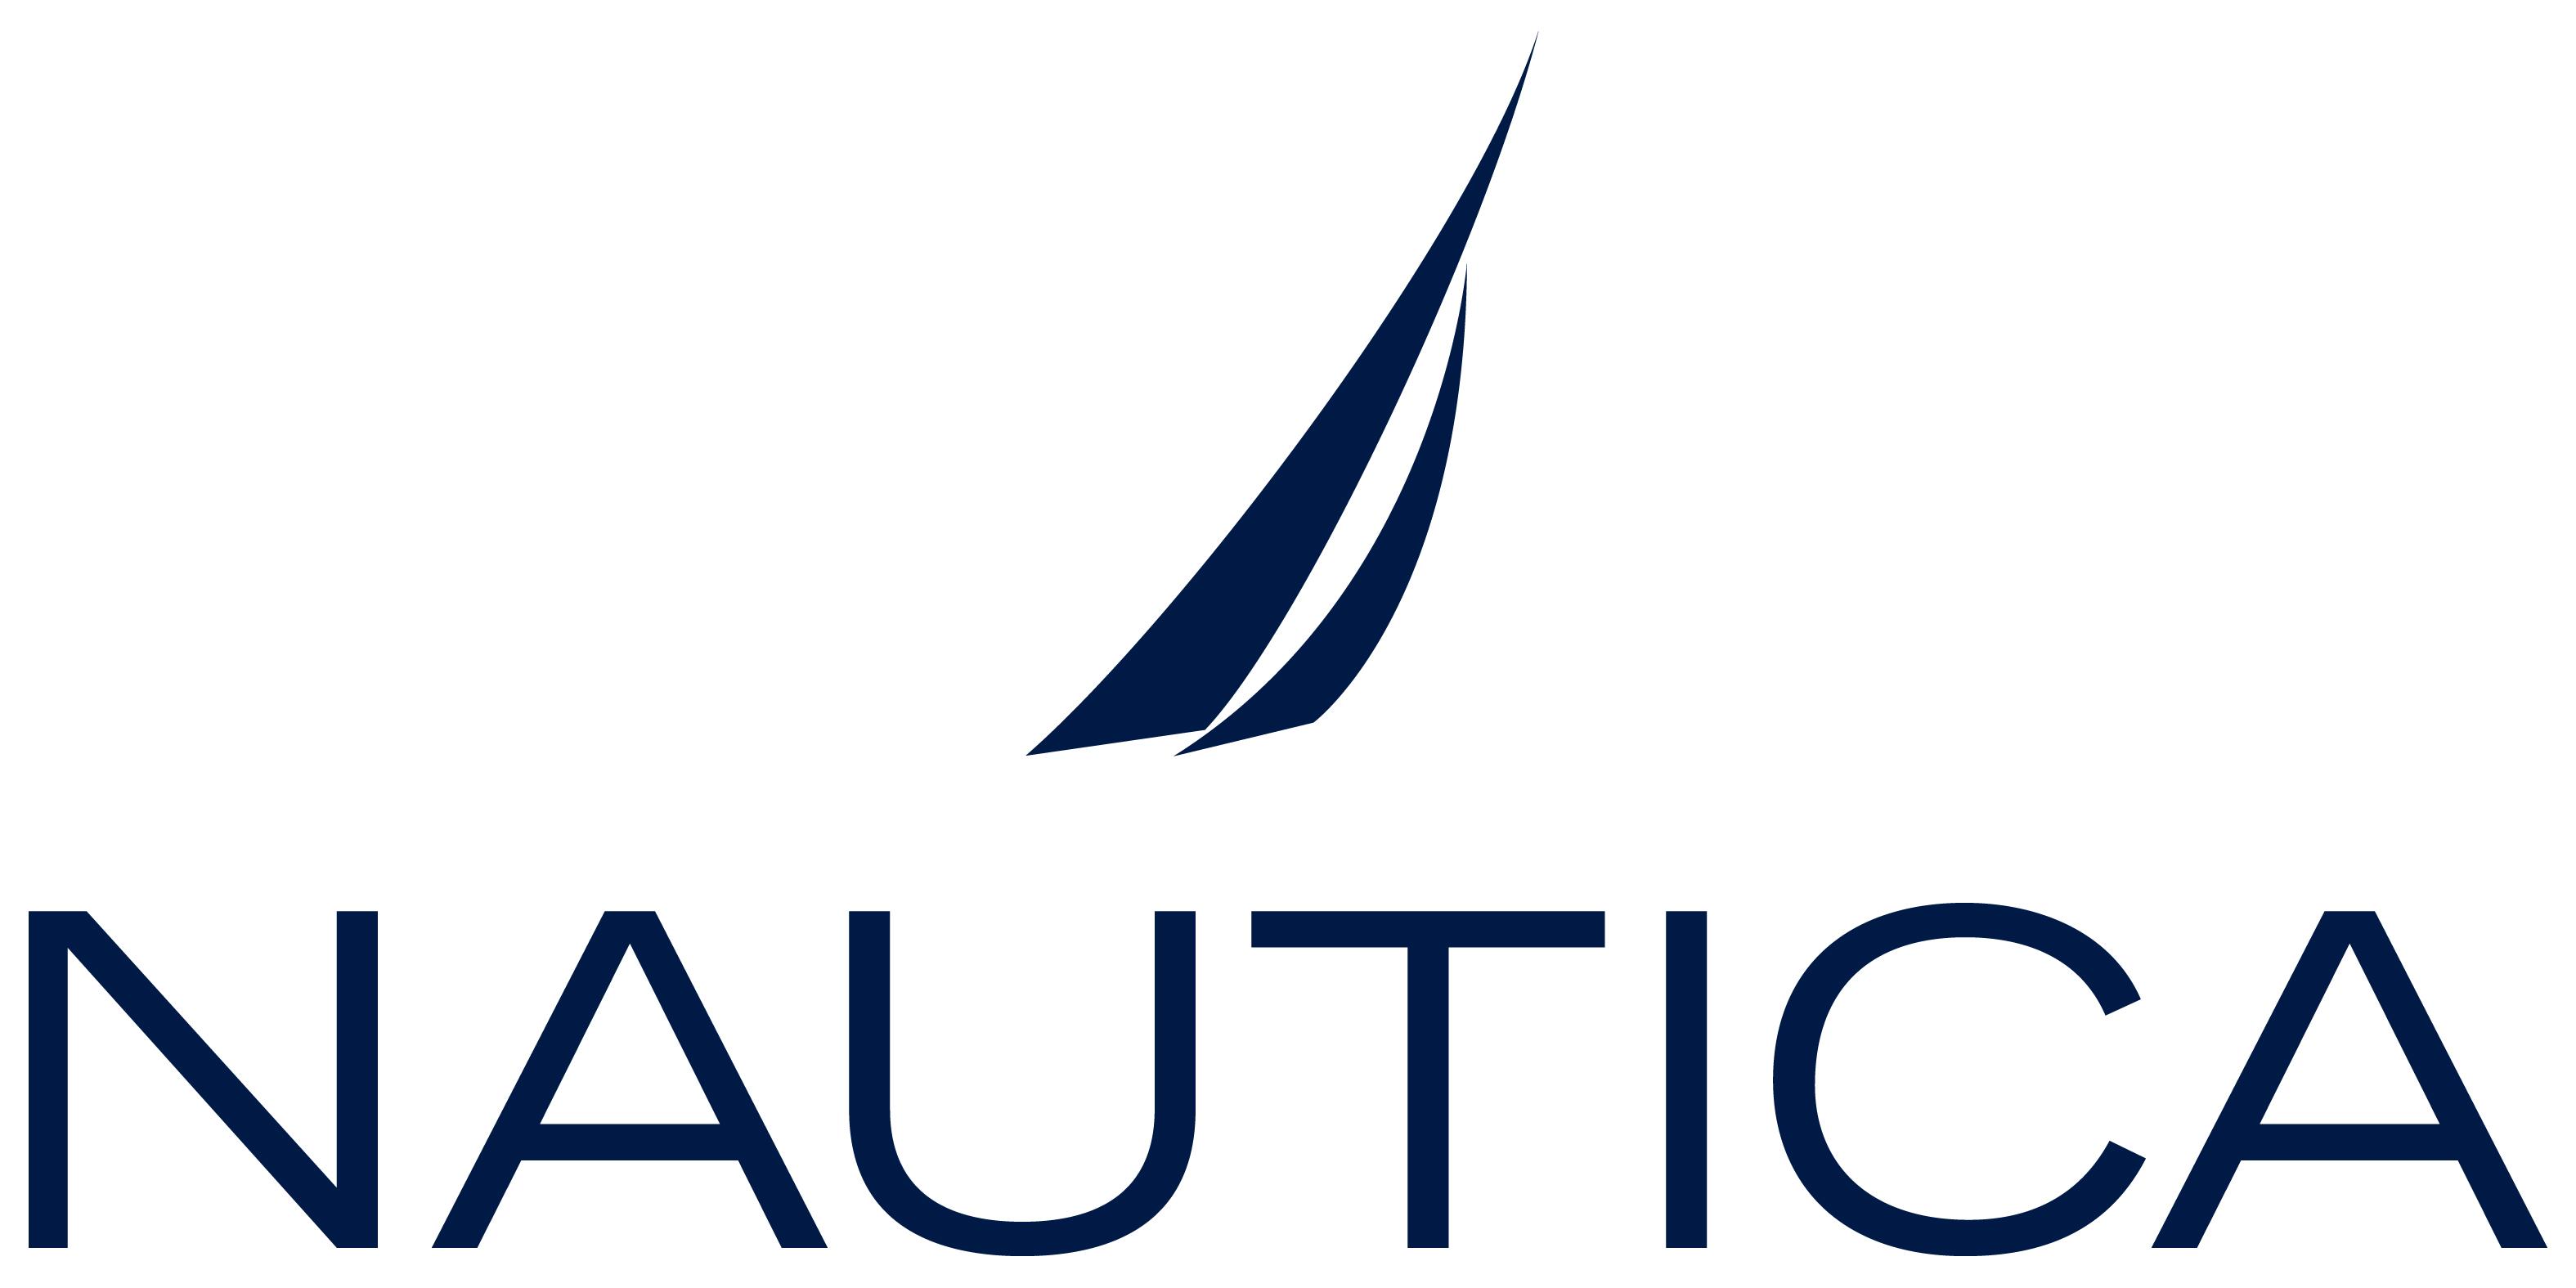 Nautica Factory Store logo